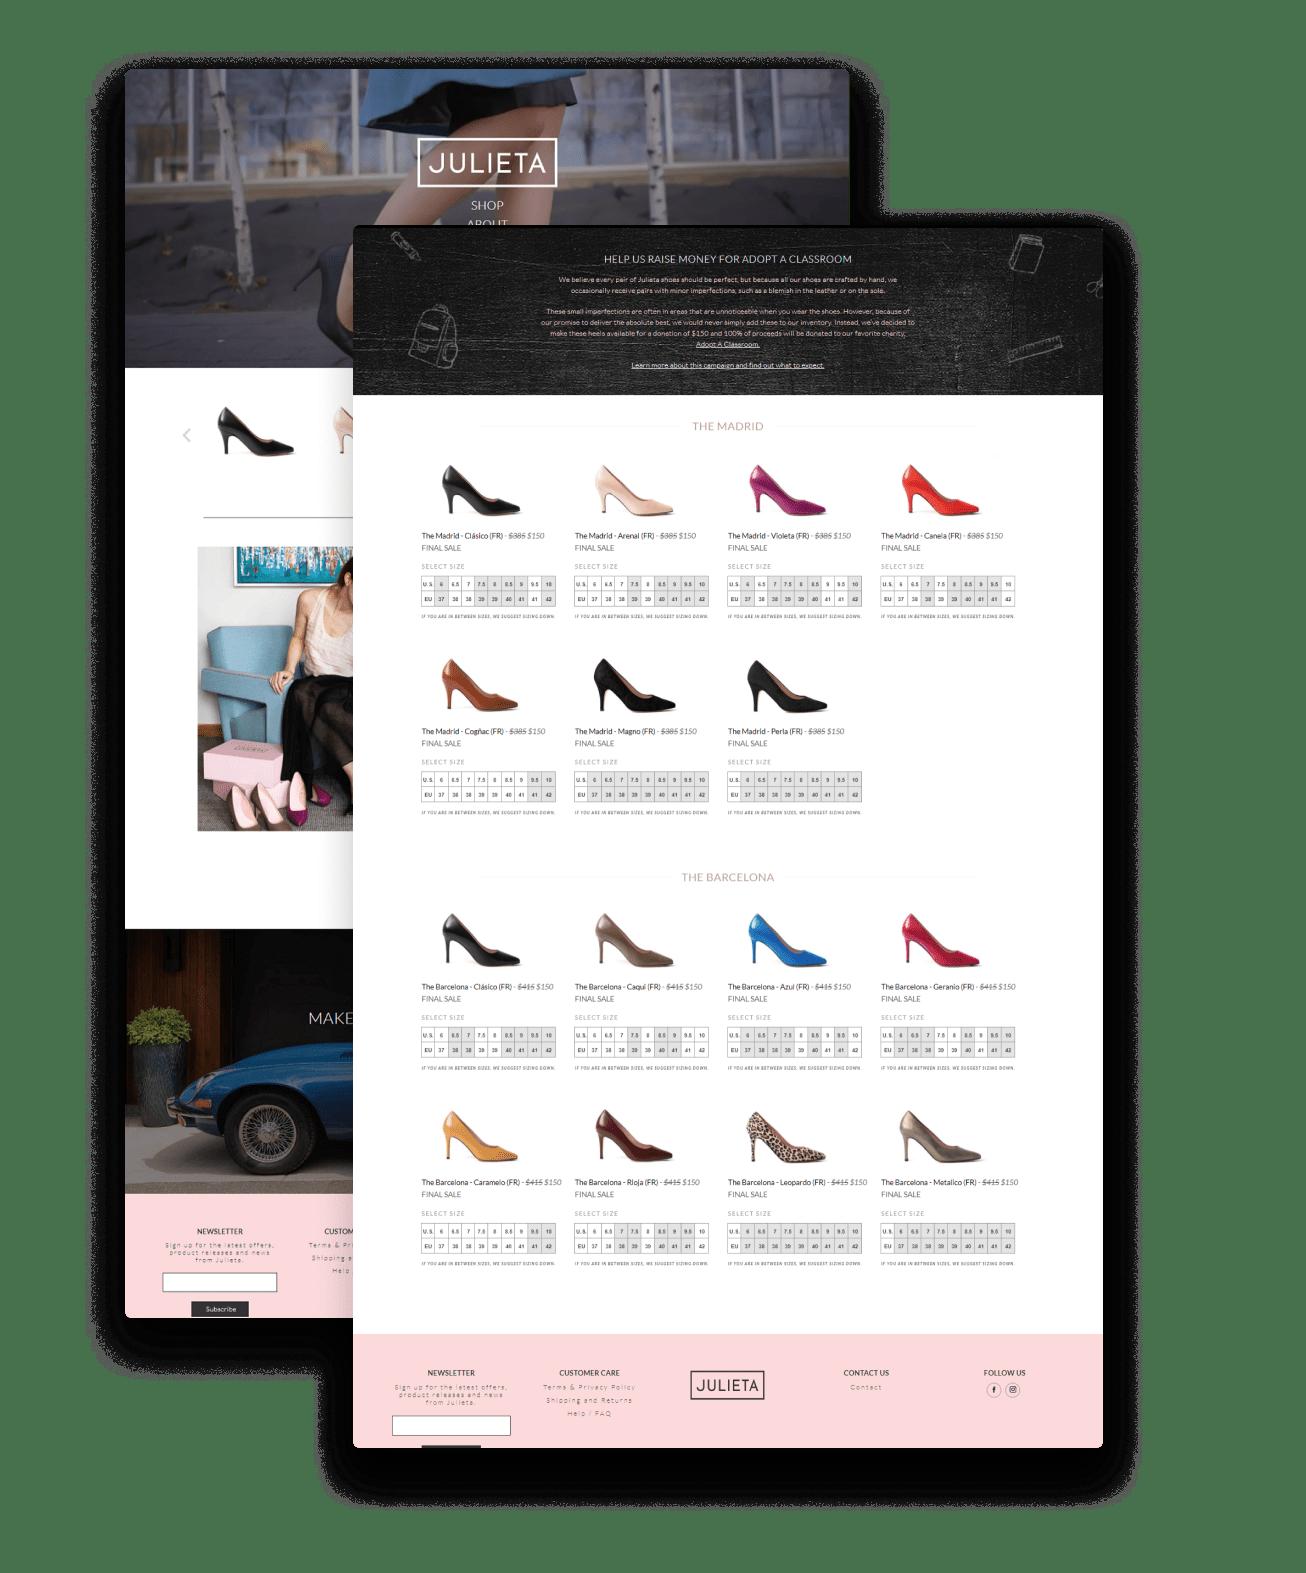 Designs Image - Julieta